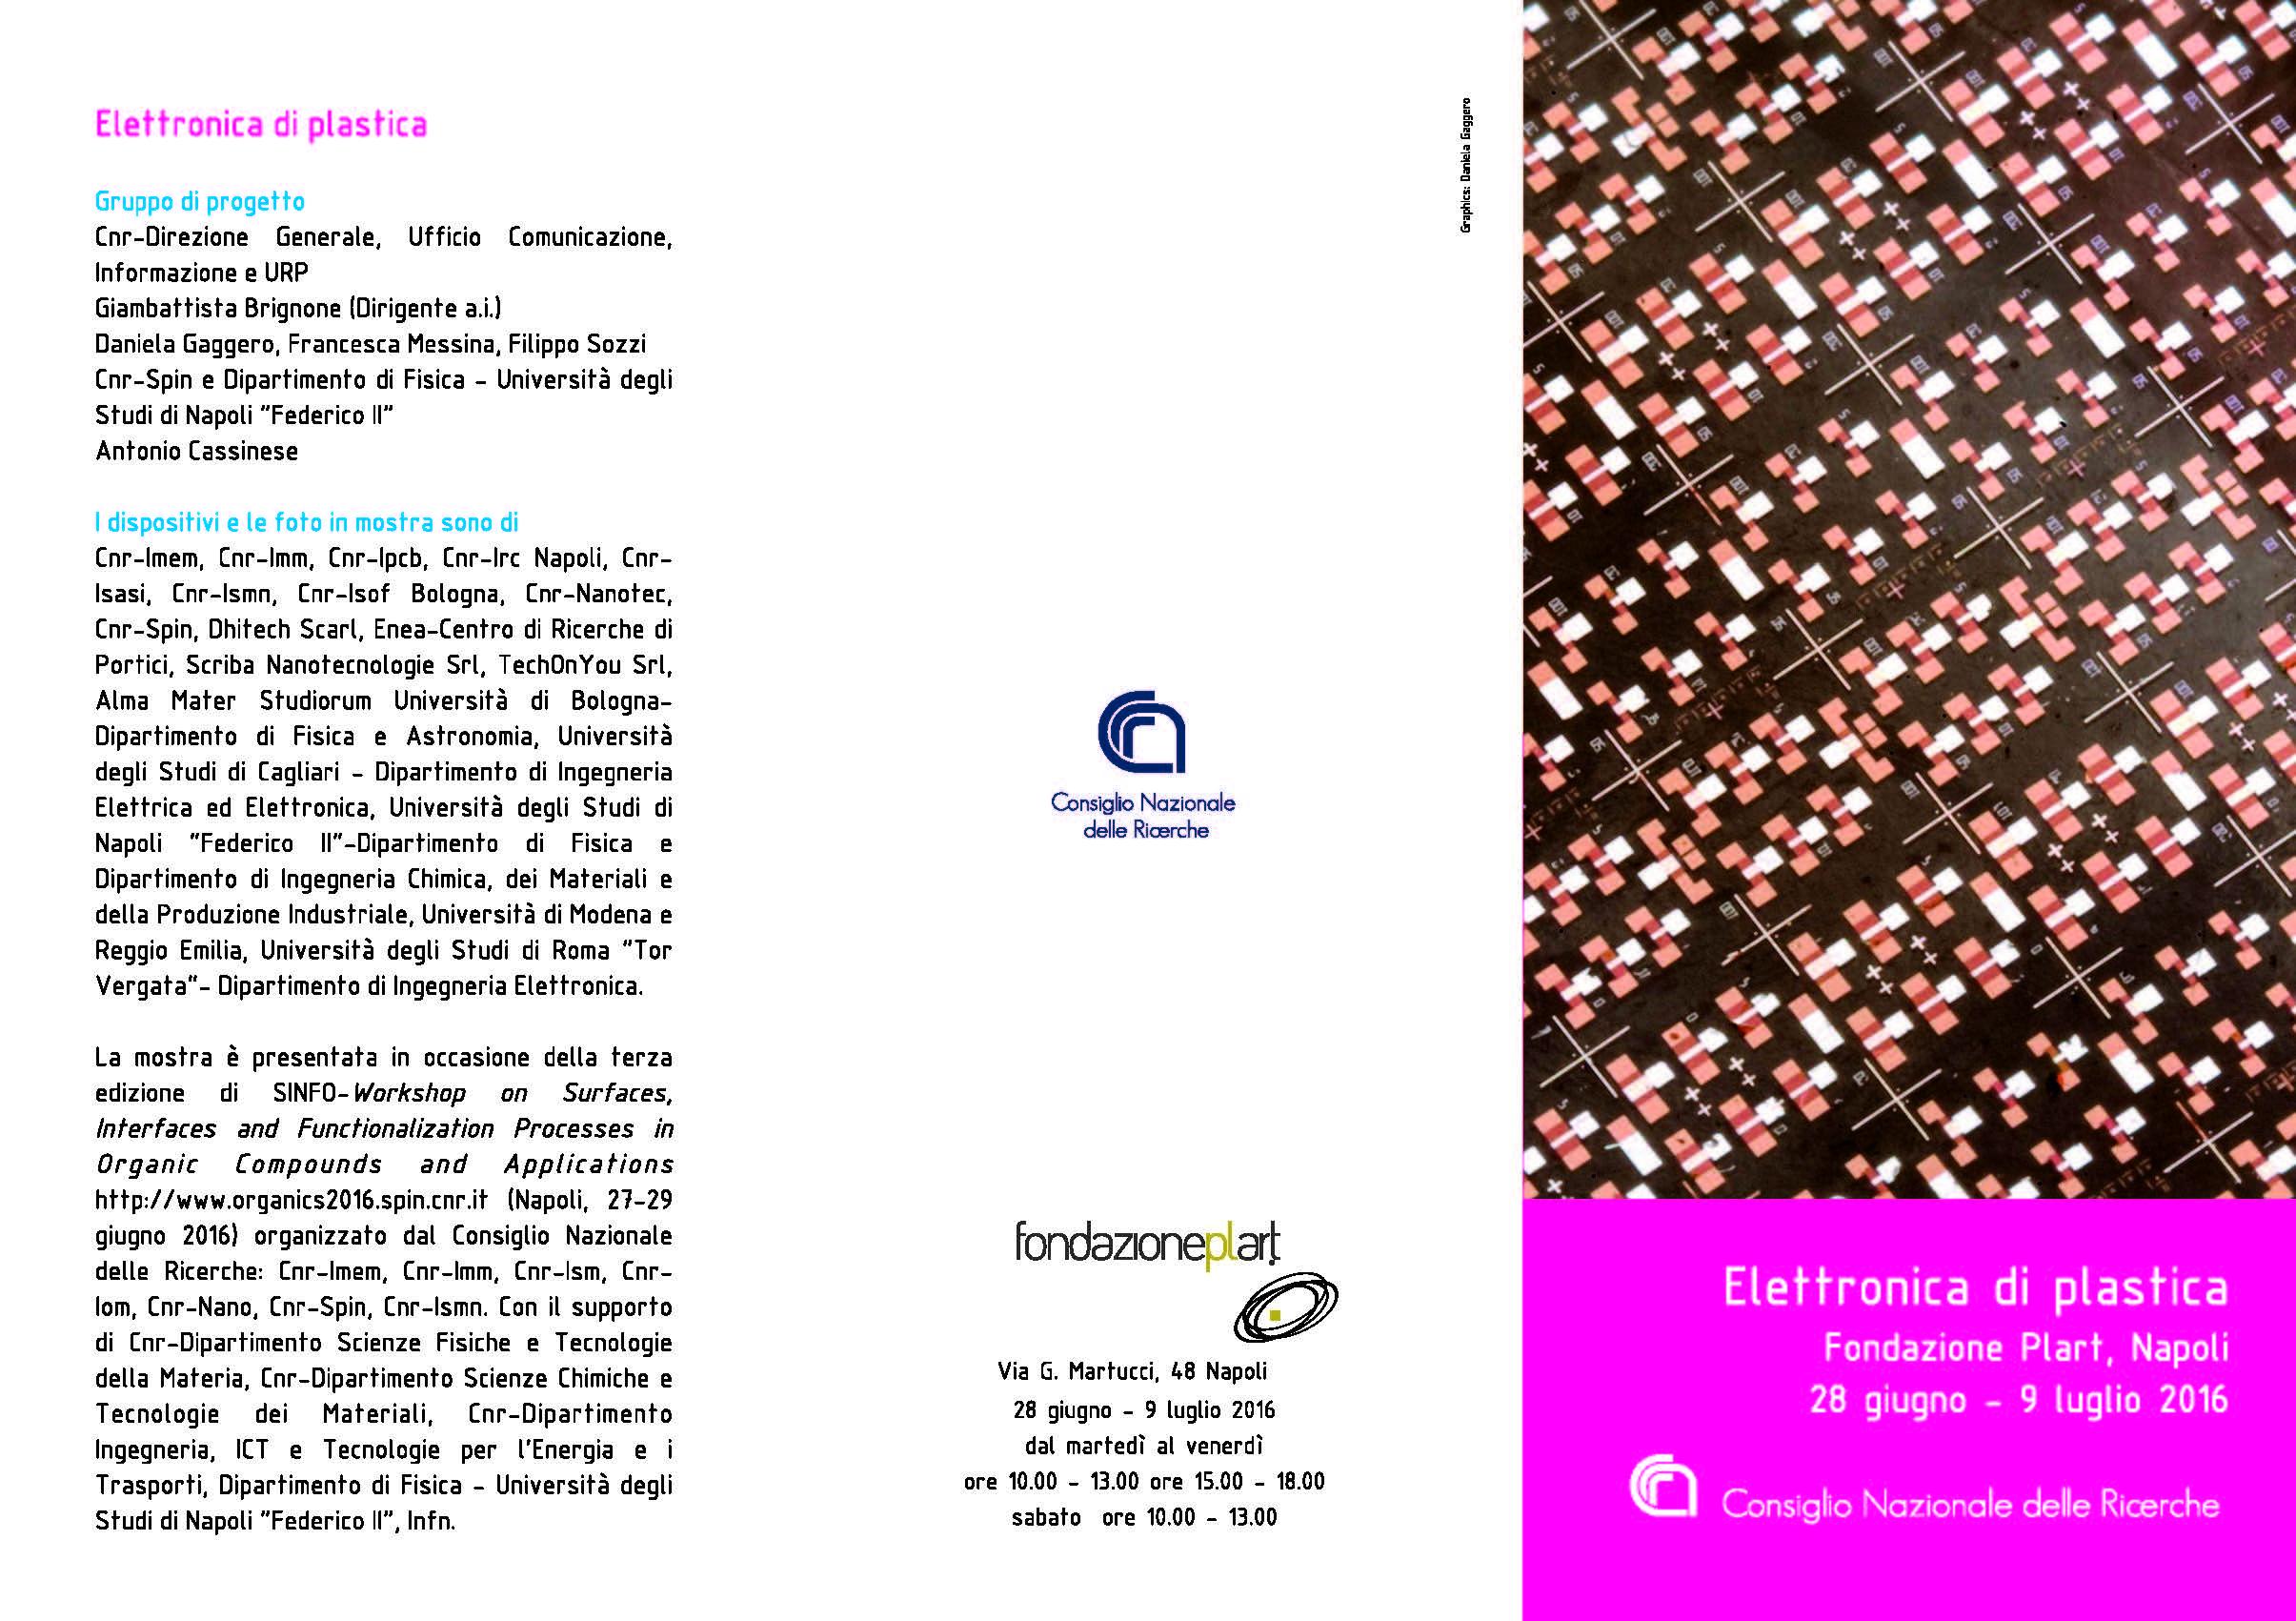 flyer elettronicaplastica Page 1